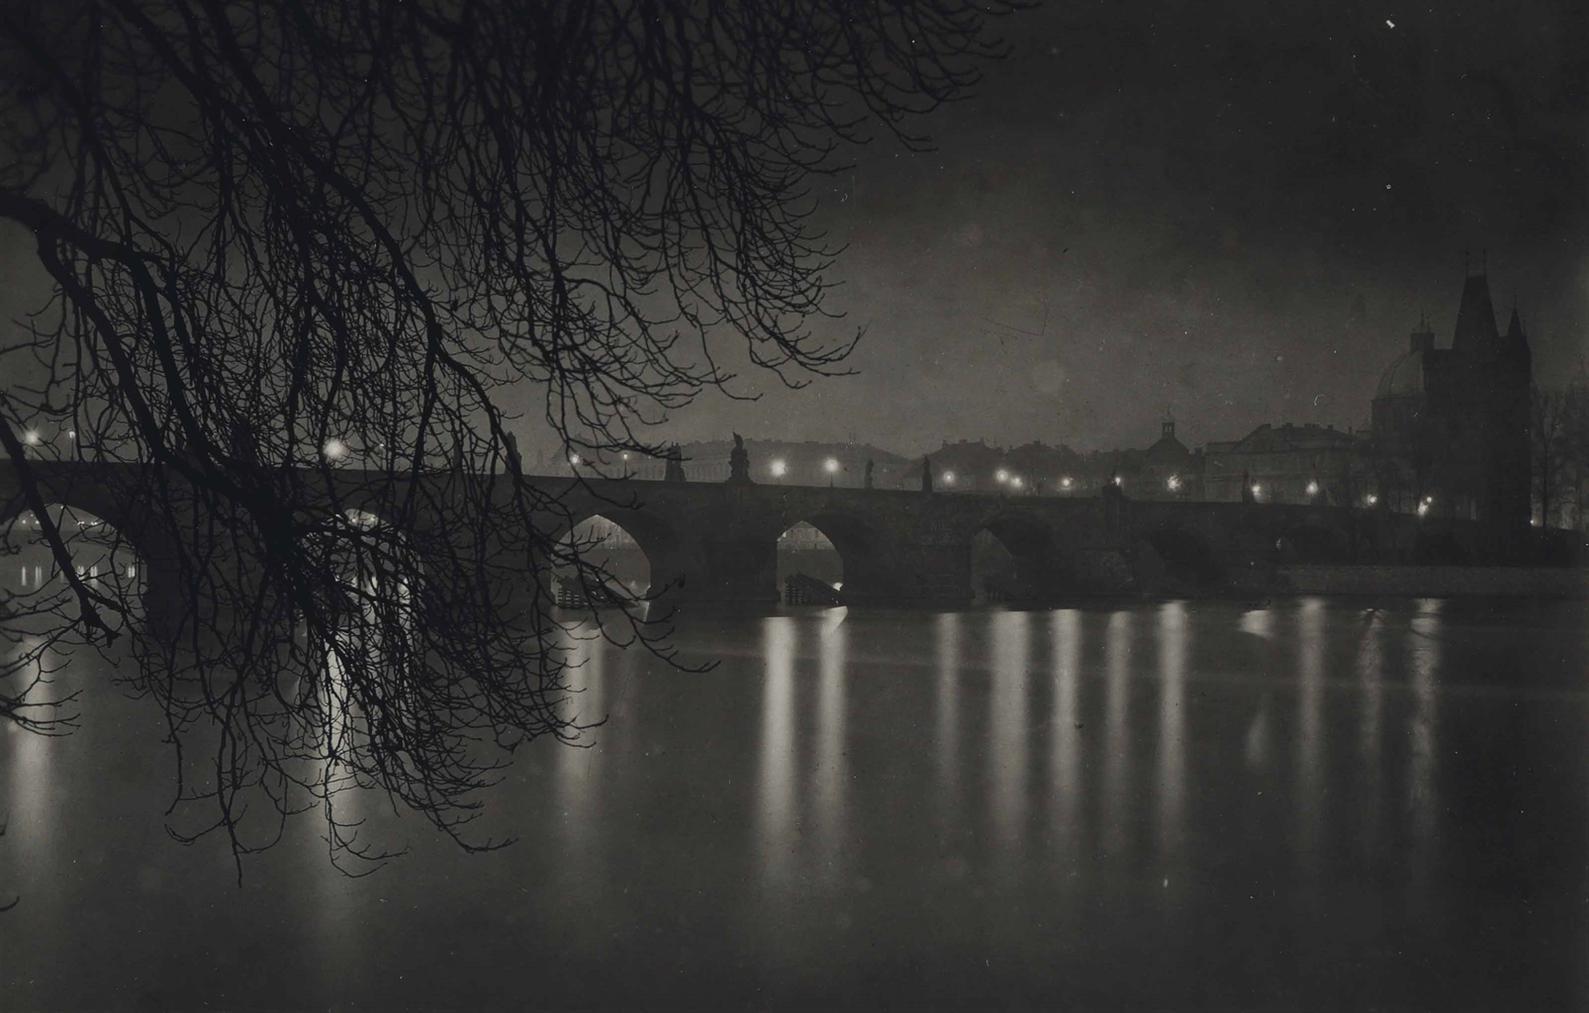 Josef Sudek-Charles Bridge, Prague-1950